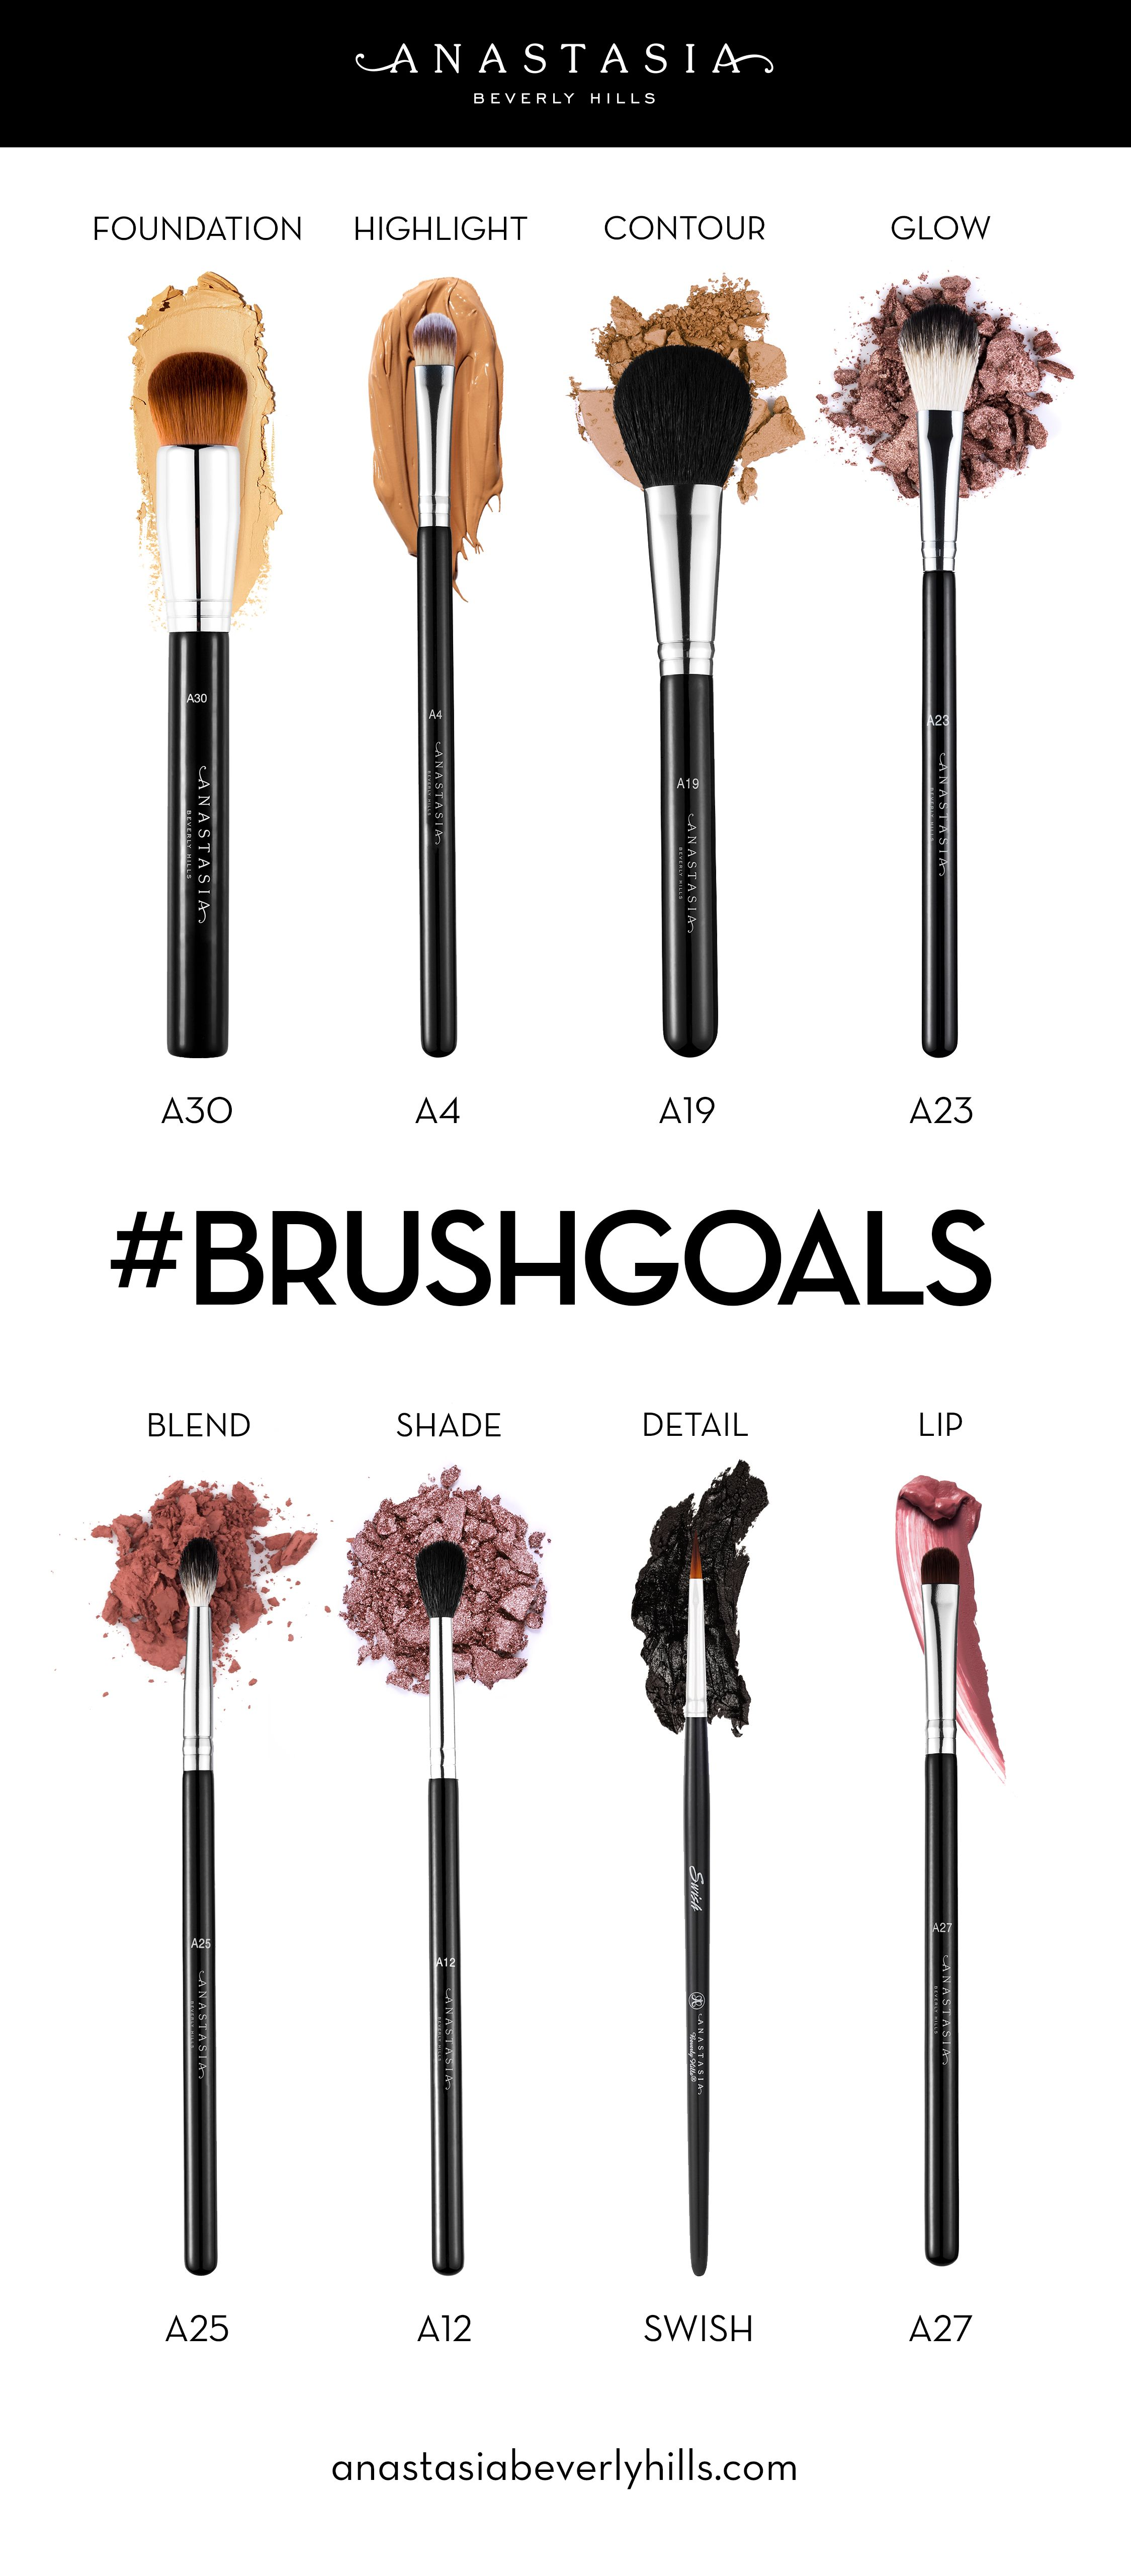 Brush Goals Anastasia Beverly Hills Makeup brush set